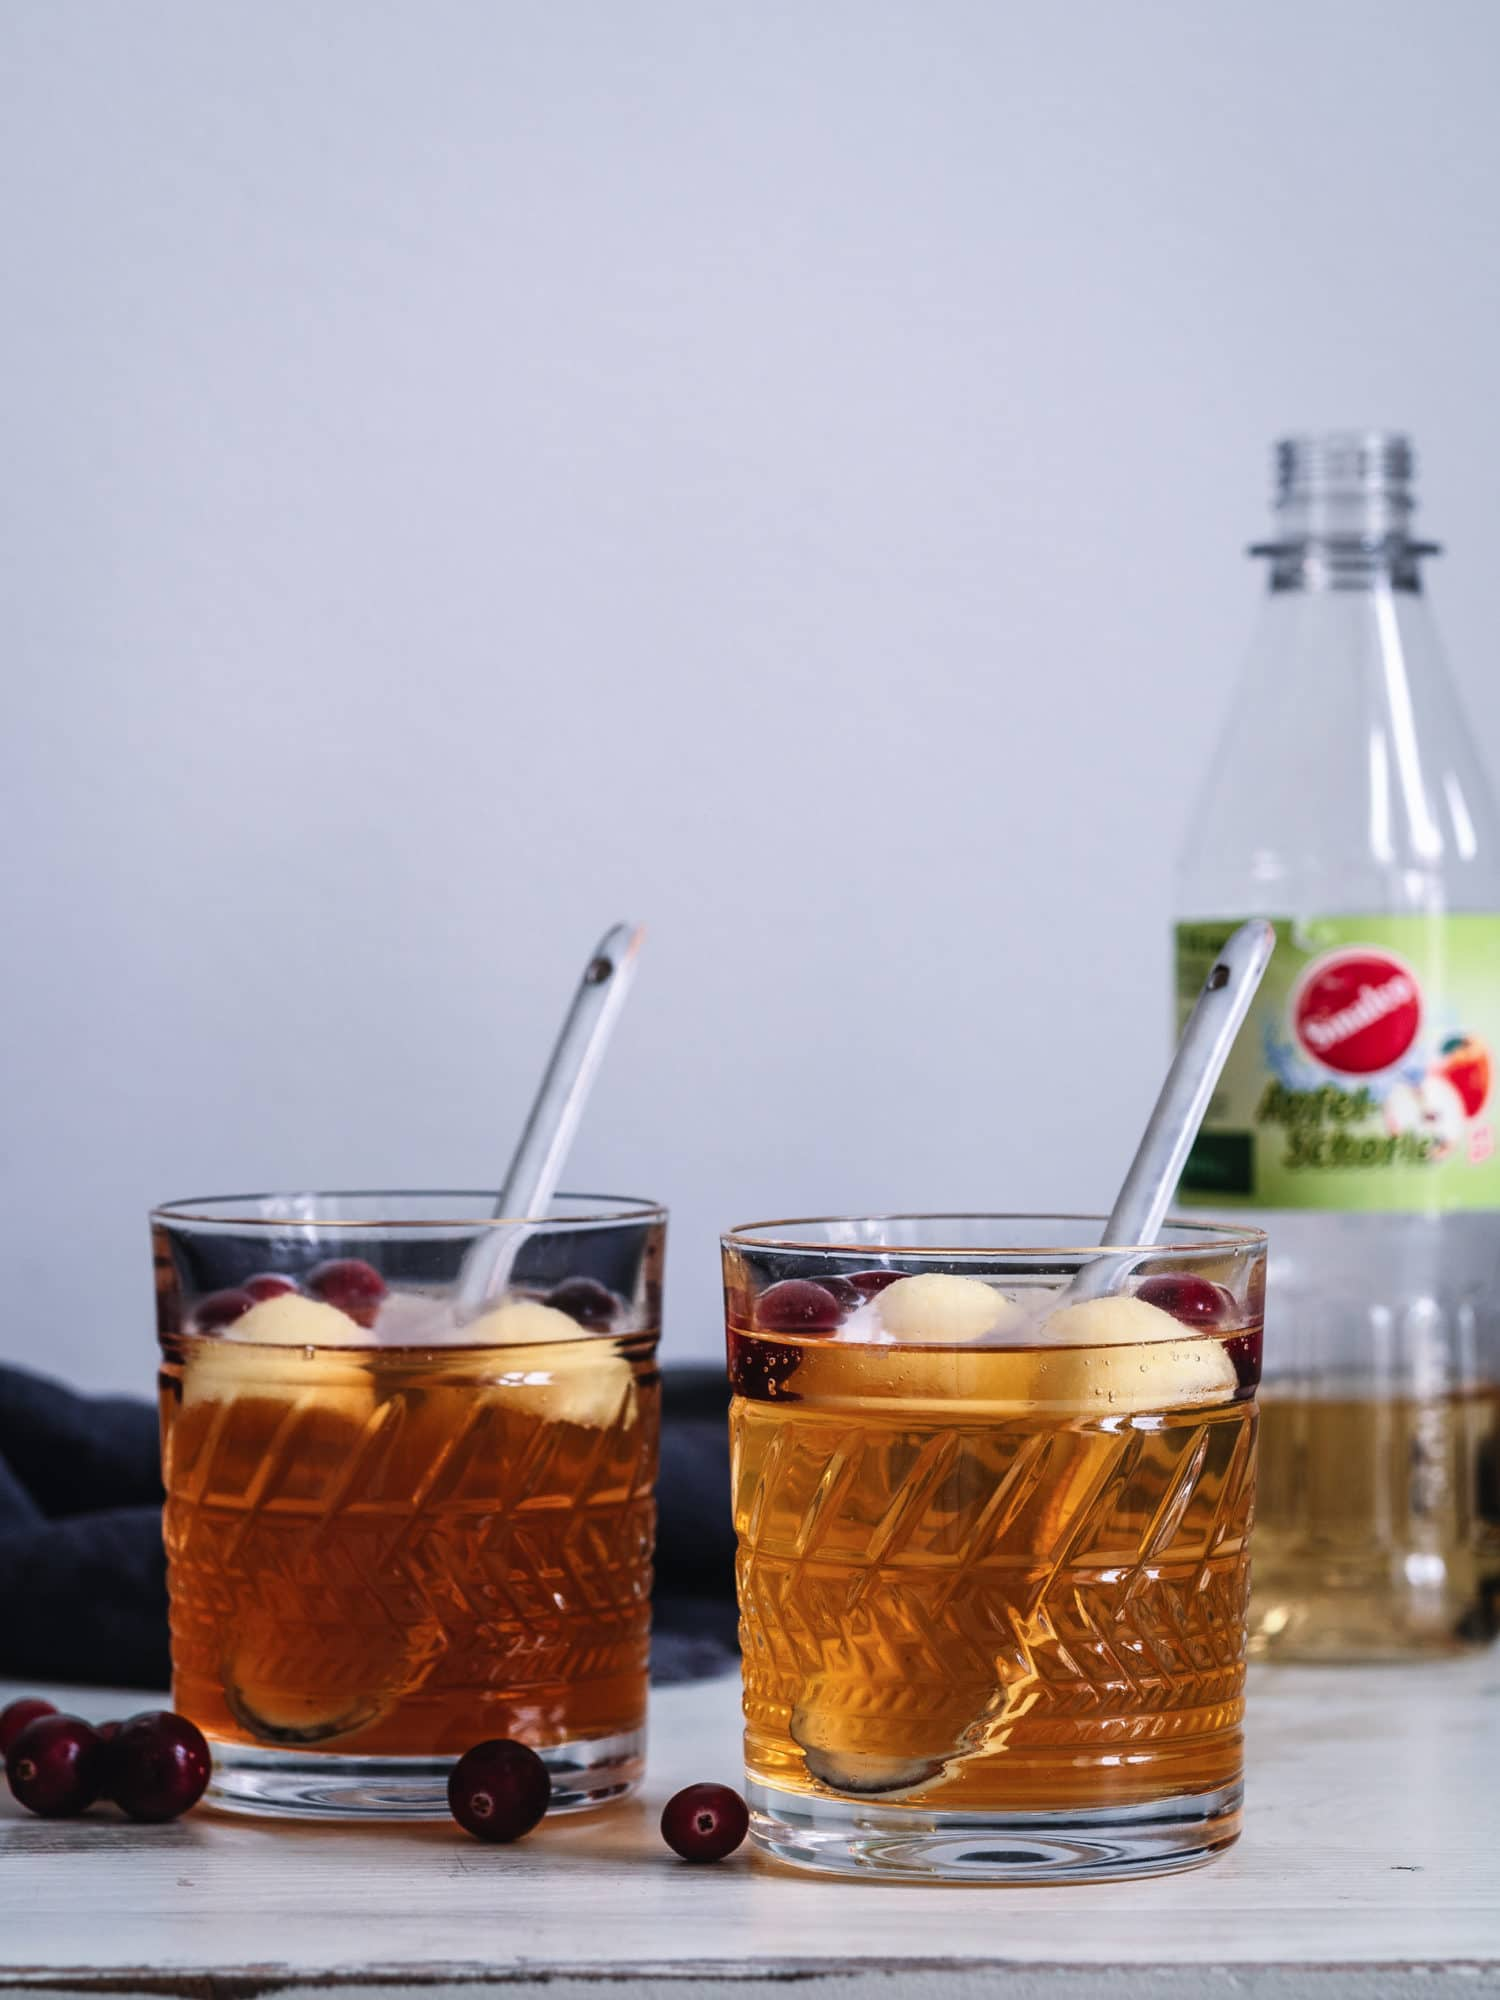 alkoholfreie Apfel Bowle mit sinalco Apfelschorle